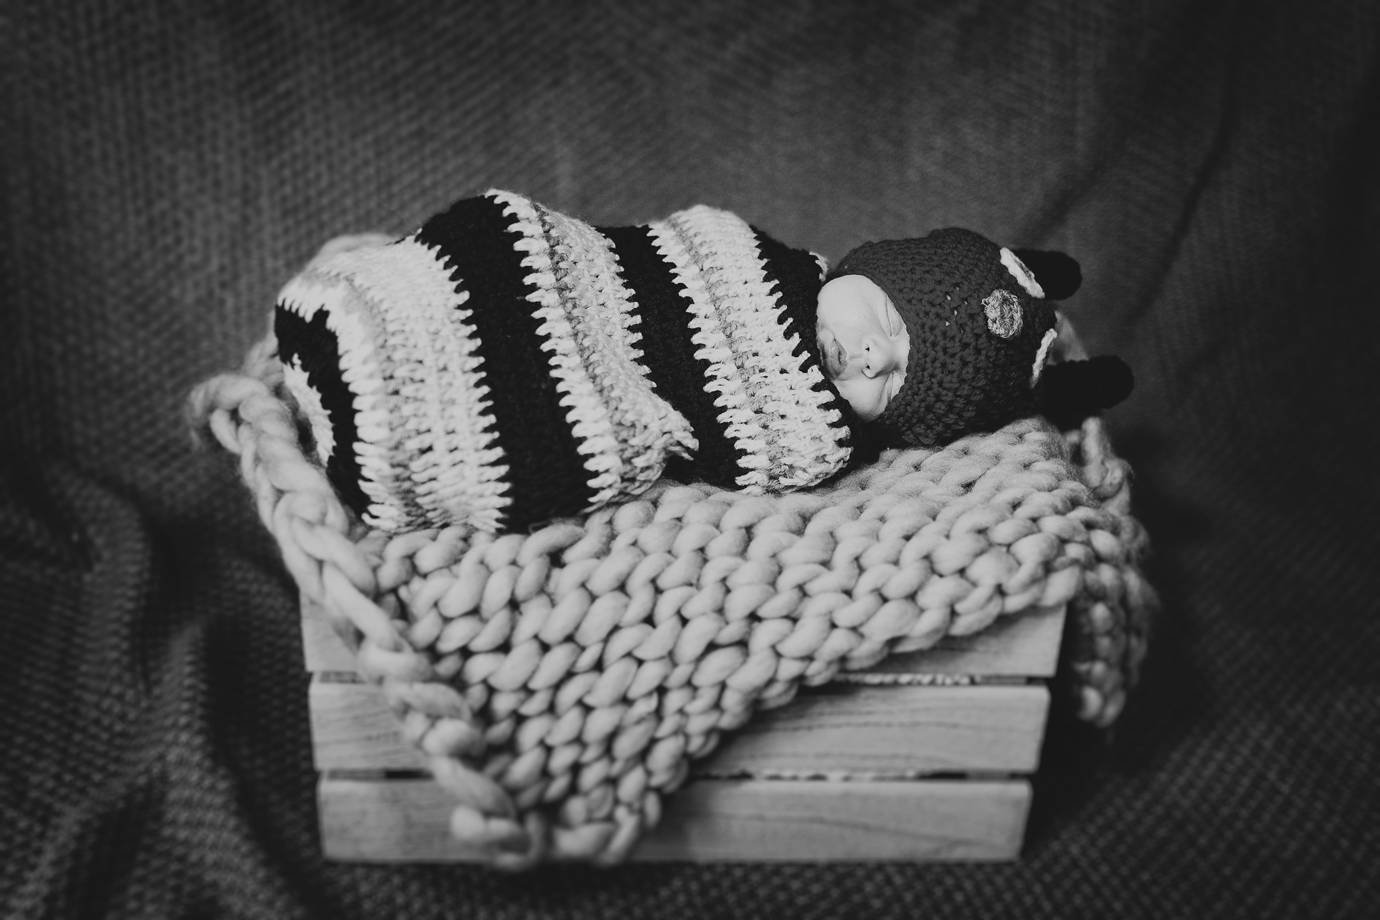 babyfotograf ritterhude 21 - Nika